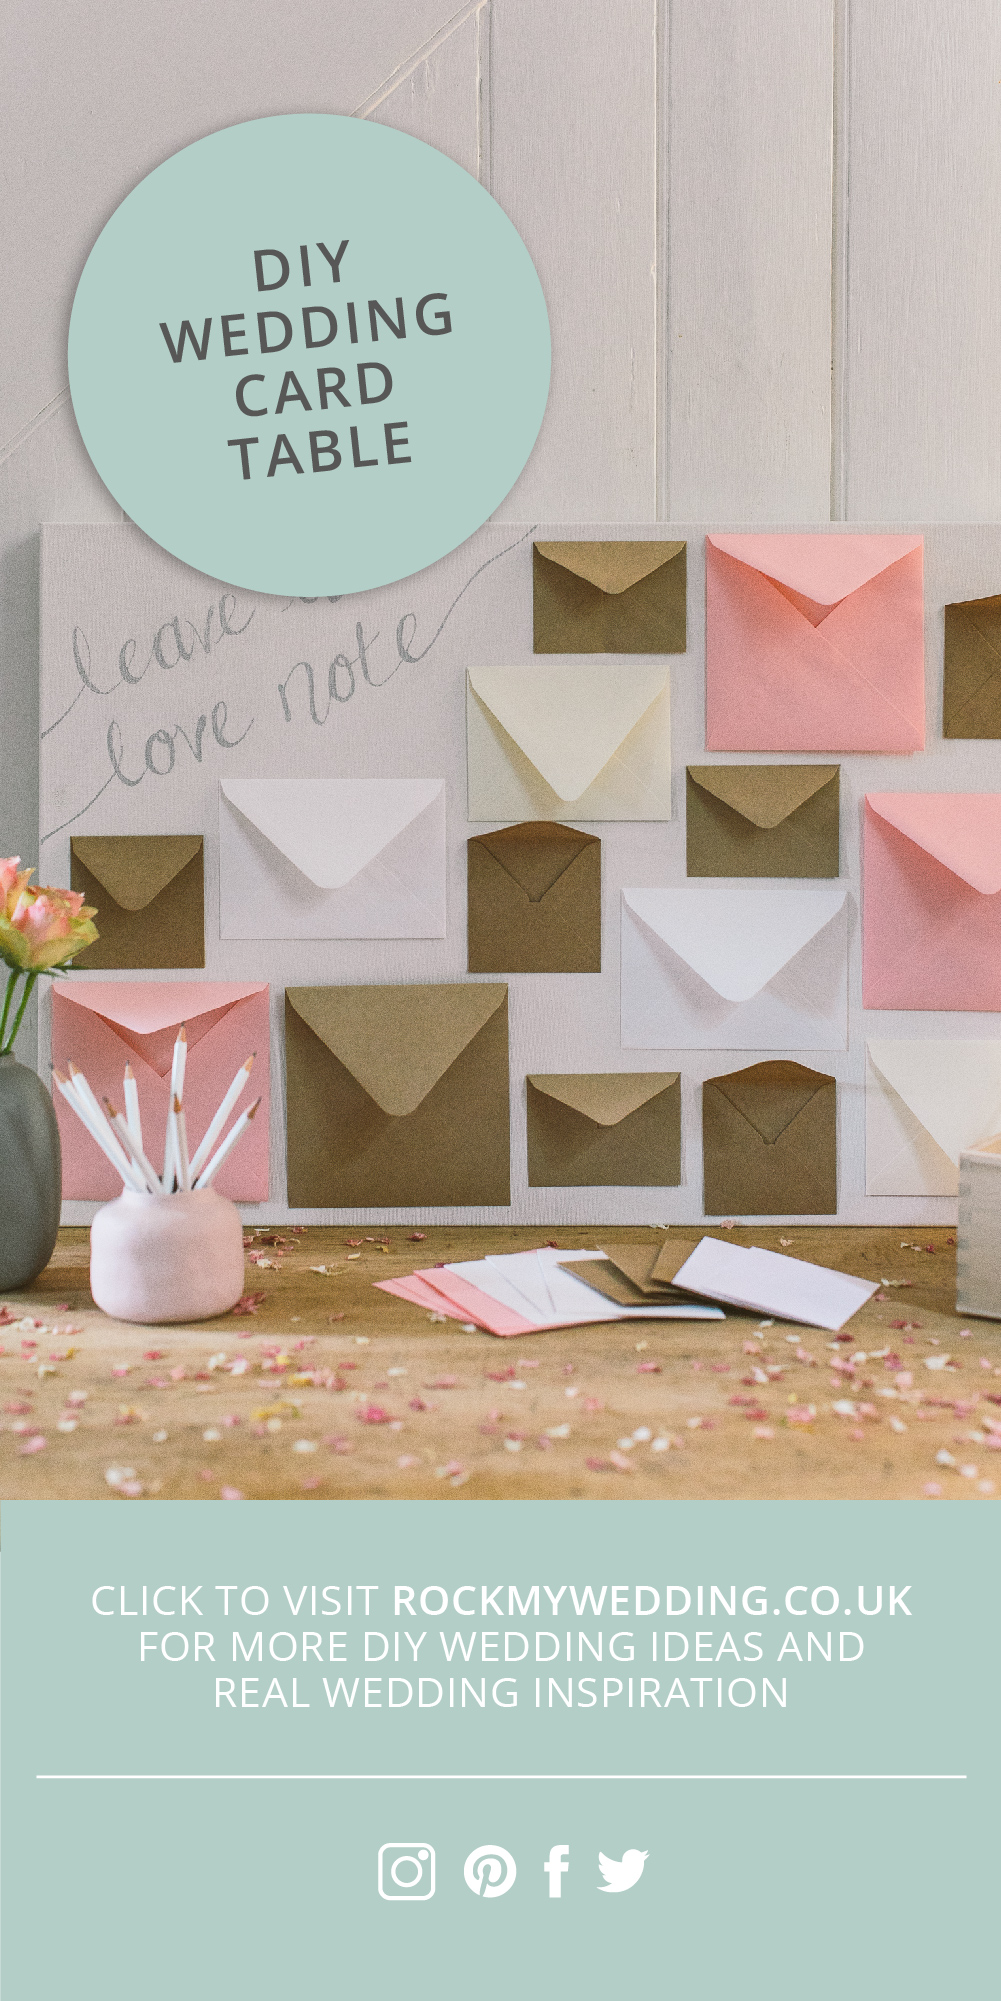 DIY Leave a Note Alternative Wedding Guest Book